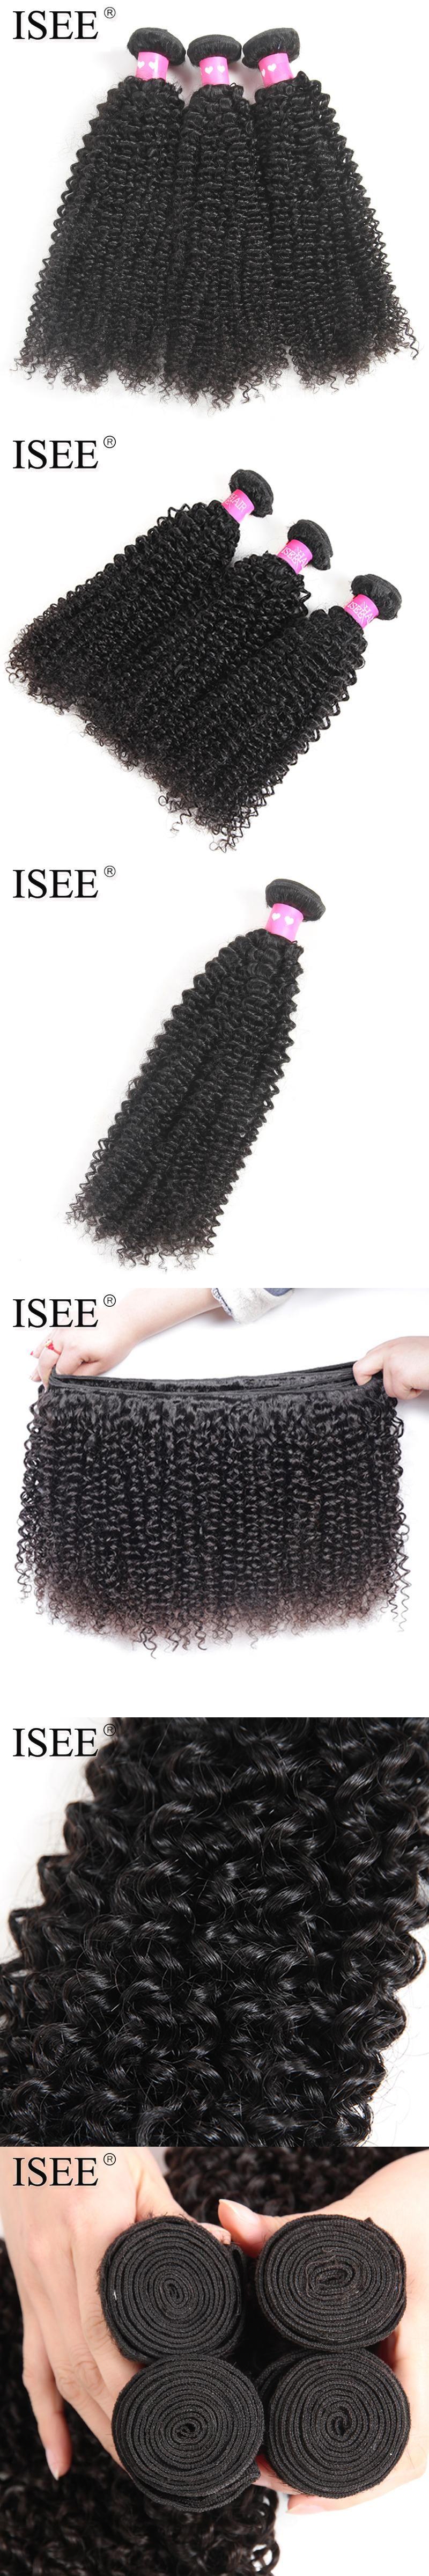 ISEE Hair Peruvian Kinky Curly Hair Weave  Human Hair Bundles